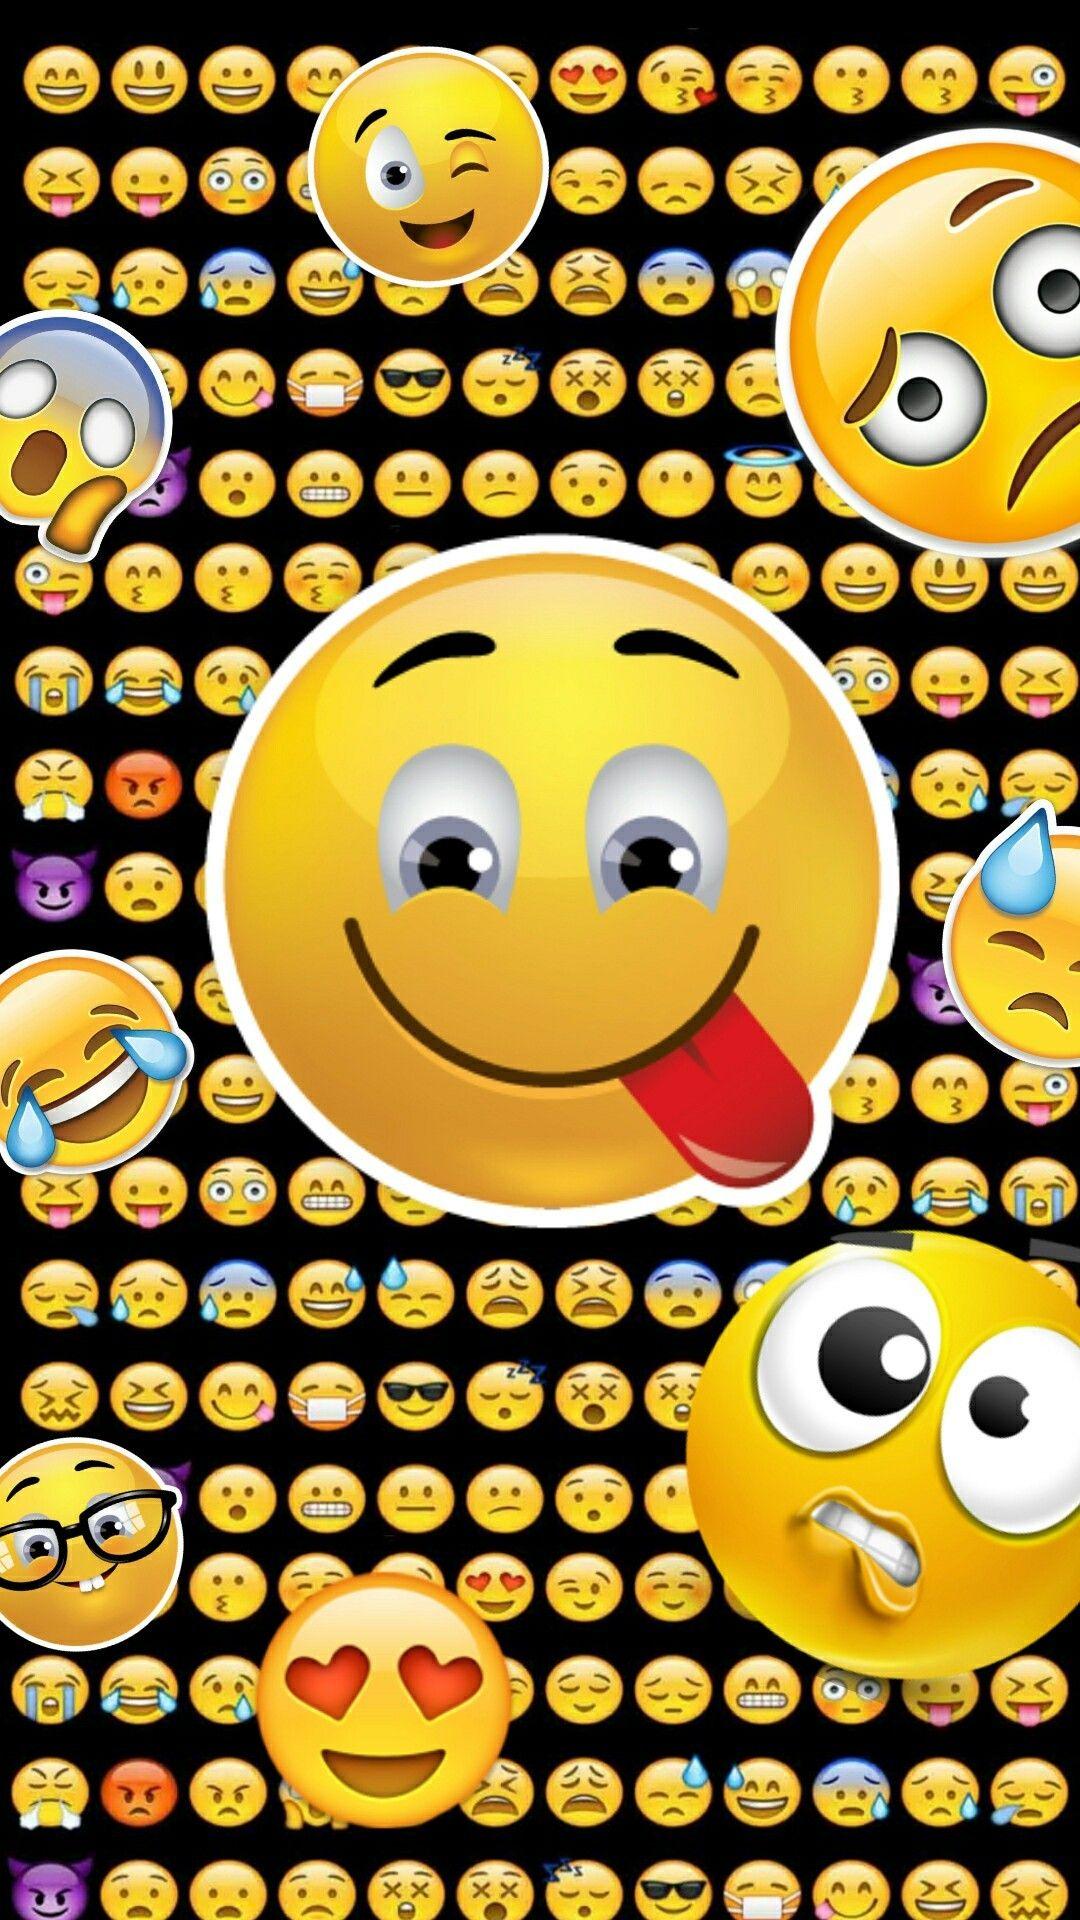 Best 7 Savage Emoji Wallpaper Iphone Background For Your Android Or Iphone Wallpapers Android Iph Emoji Wallpaper Iphone Emoji Wallpaper Cute Emoji Wallpaper